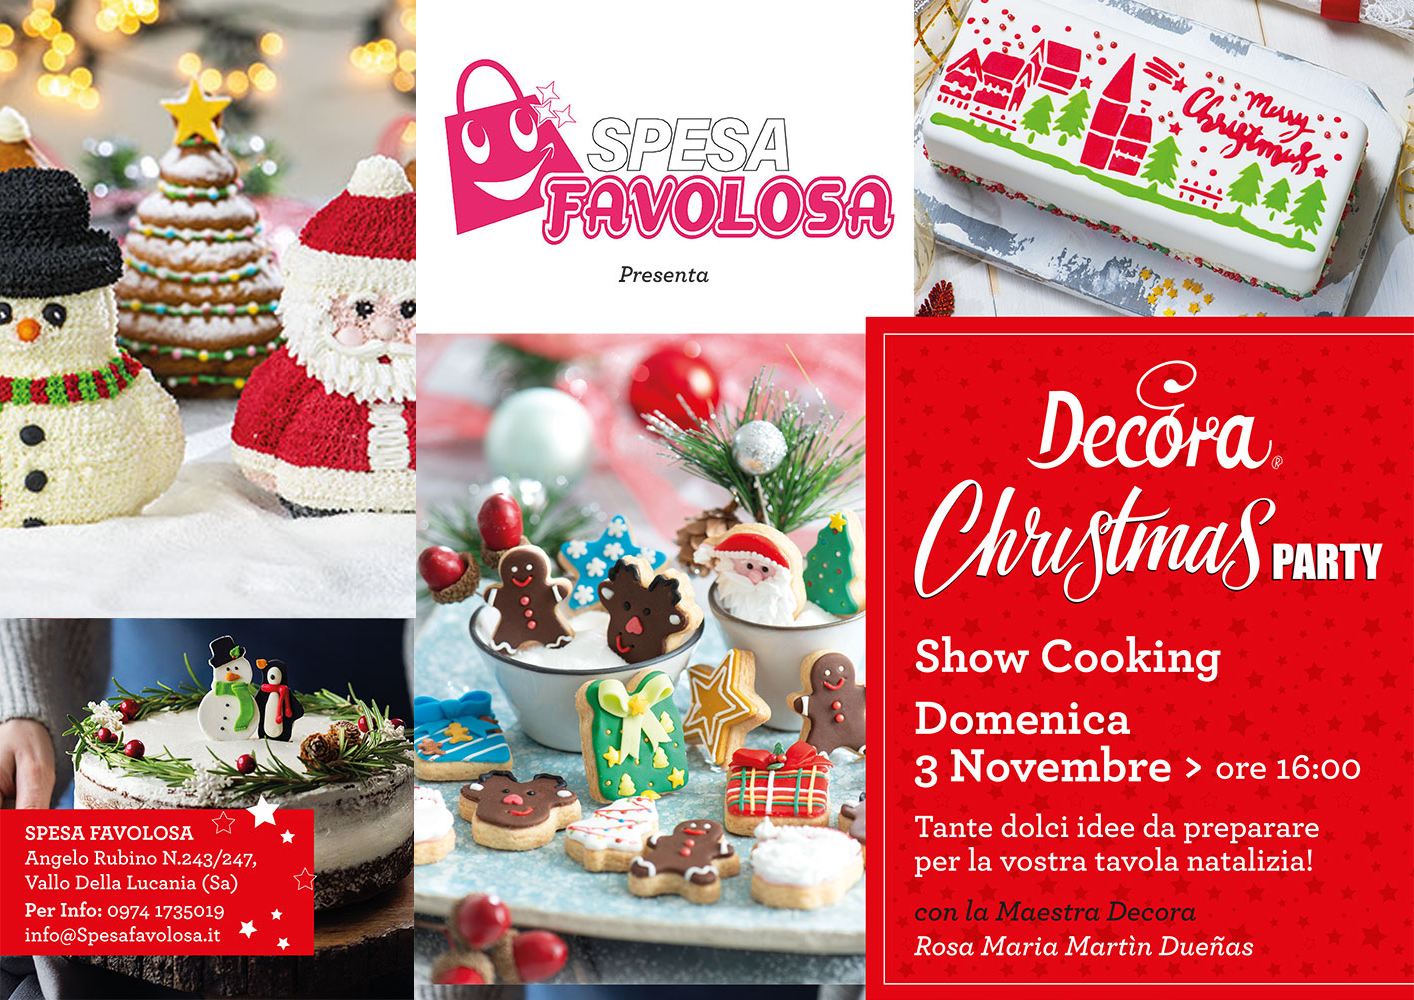 Decora Christmas Party Spesa Favolosa